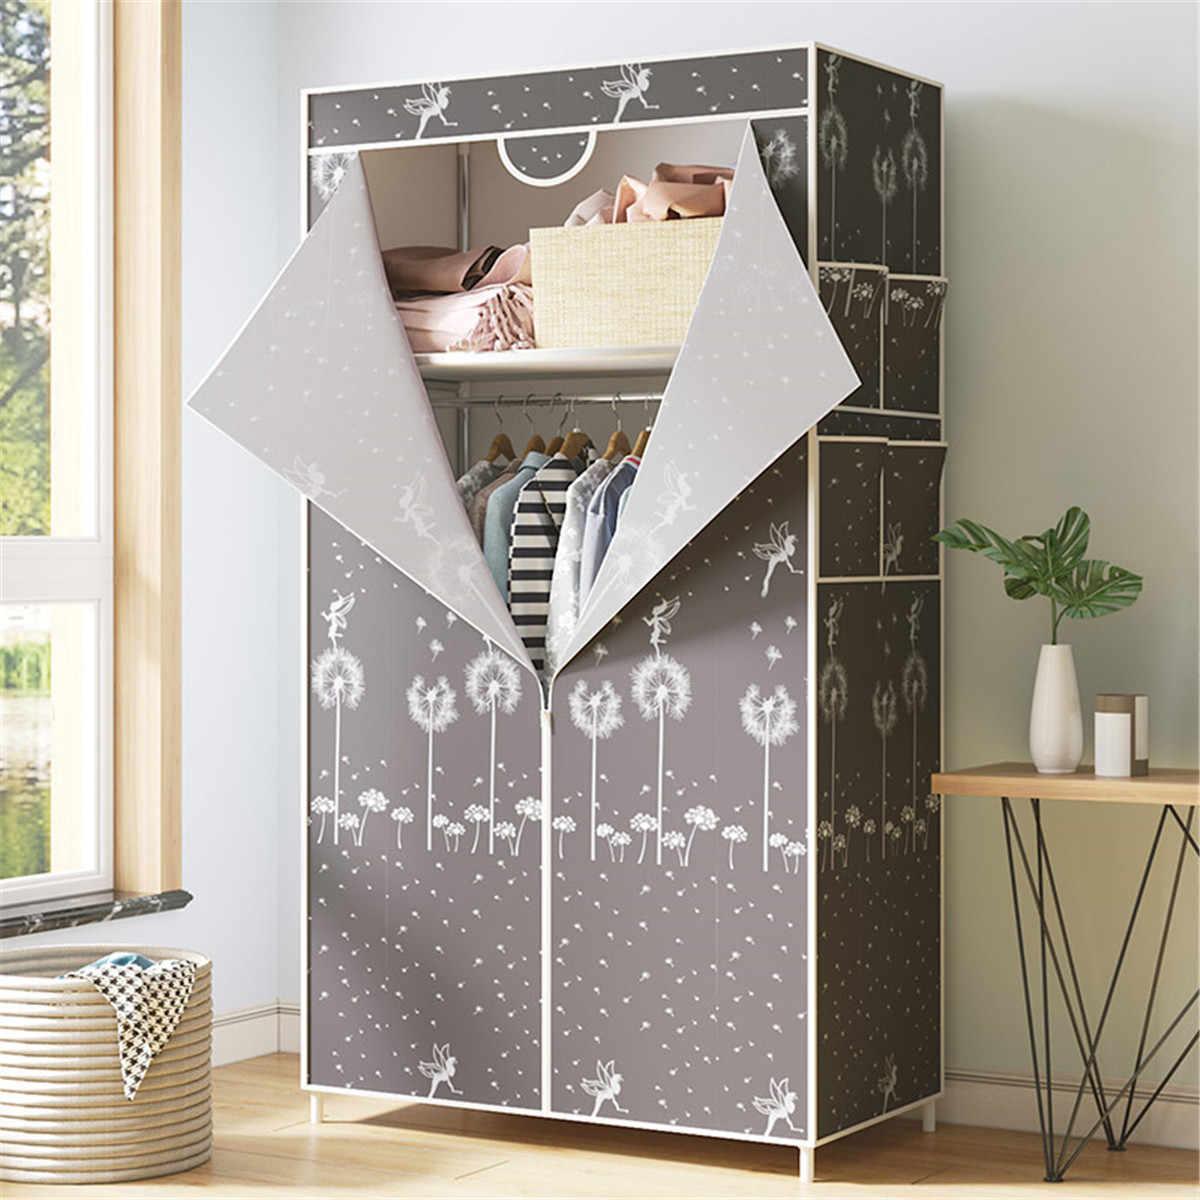 Modern Wardrobe Non Woven Fabric Folding Cloth Storage Cabinet Diy Assembly Moisture Dustproof Wardrobes Closet 70x45x160cm Wardrobes Aliexpress